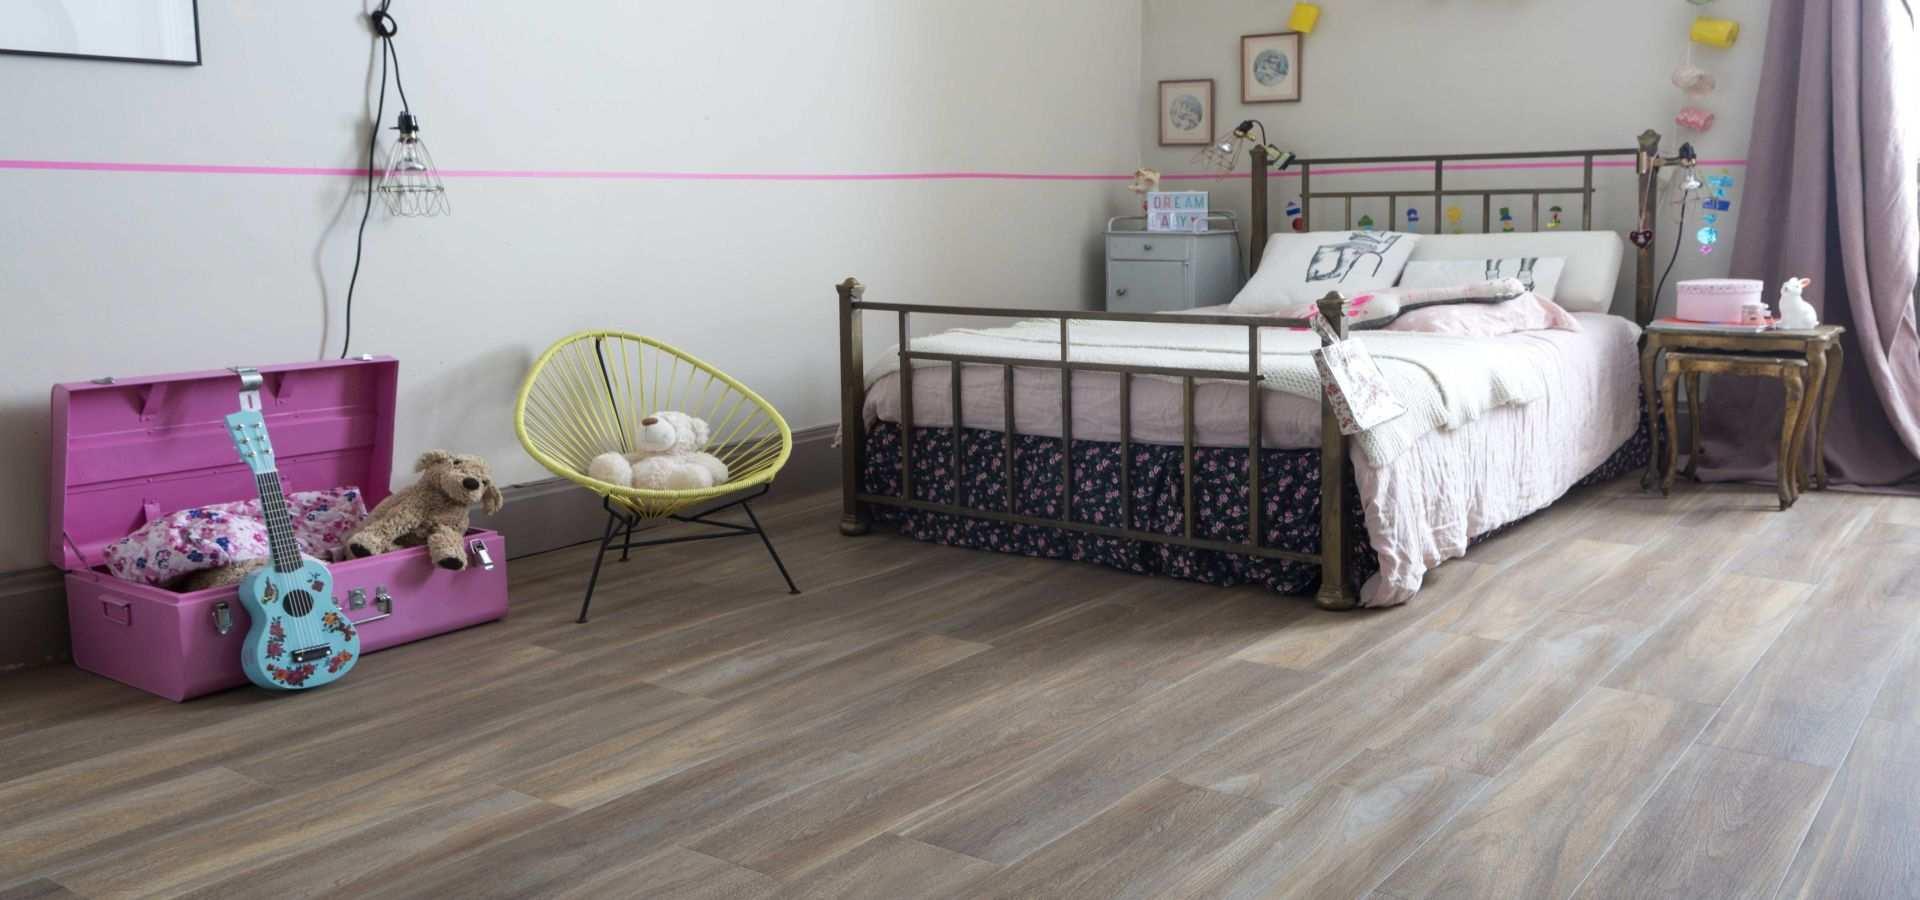 Bild Kinderzimmer Designvinyl Bodenbelag Holz dunkel